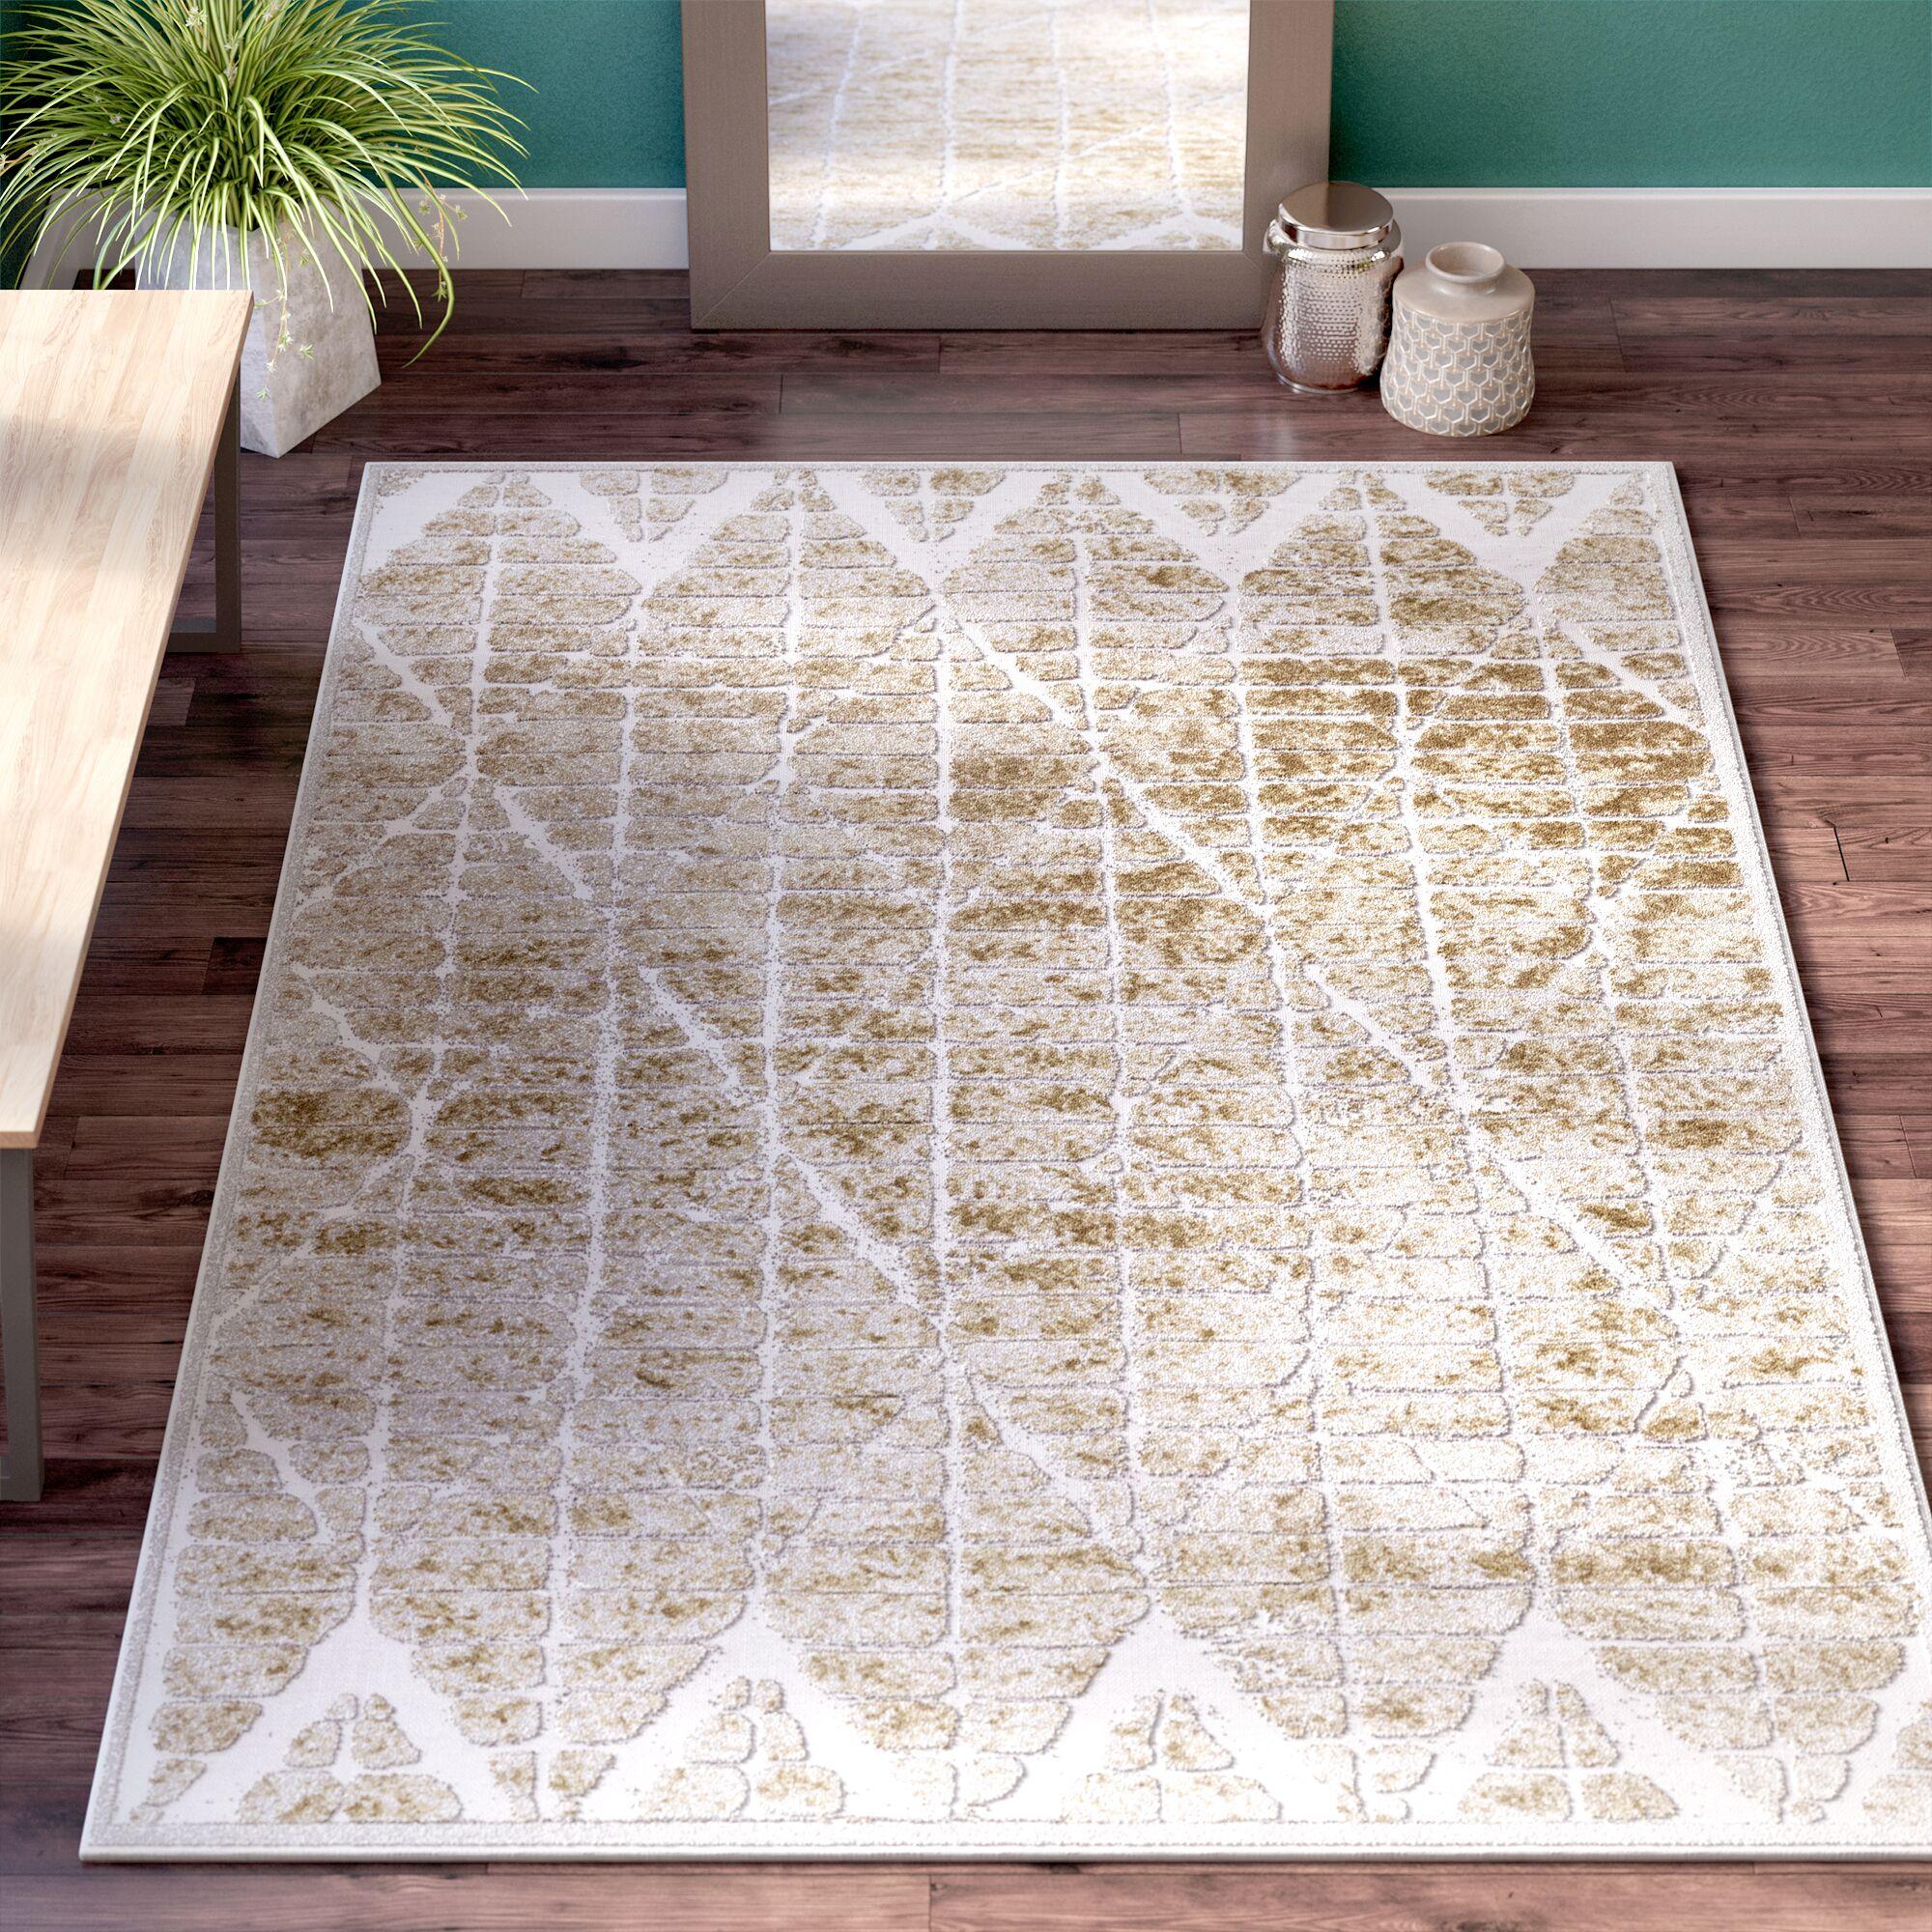 Dolezal Brown/White Area Rug Rug Size: Rectangle 5'3